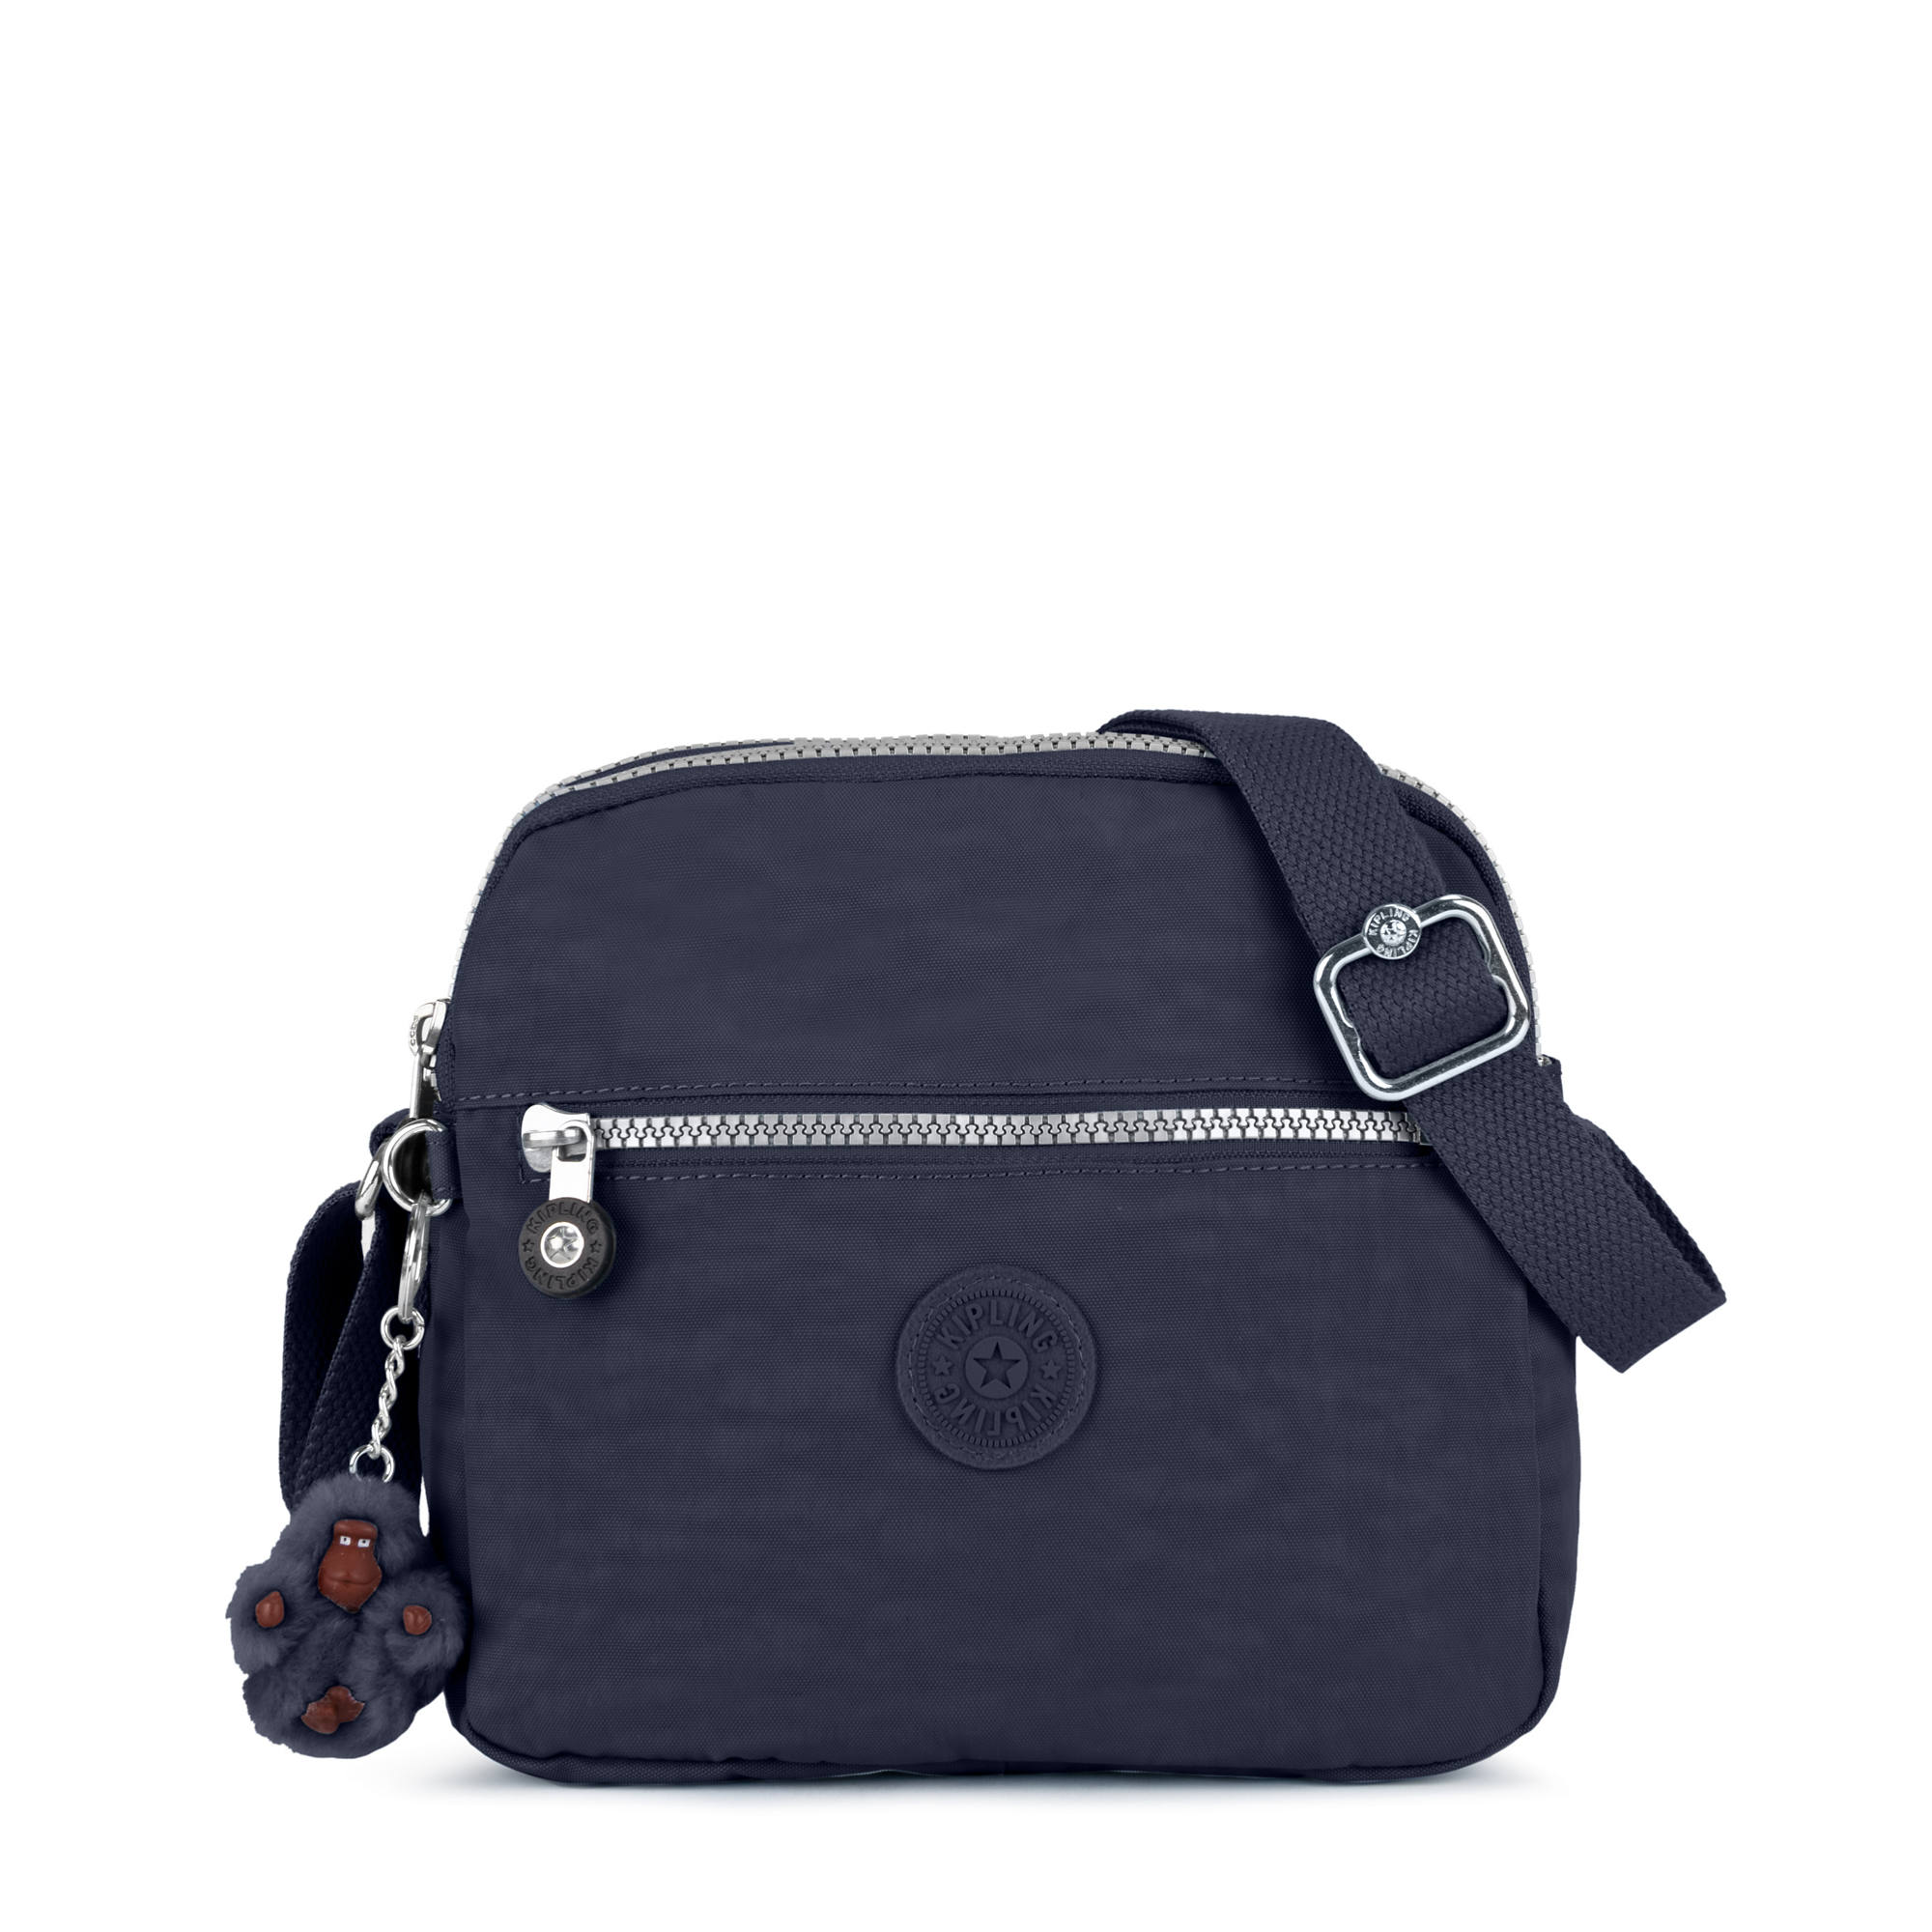 Kipling Keefe Crossbody Bag